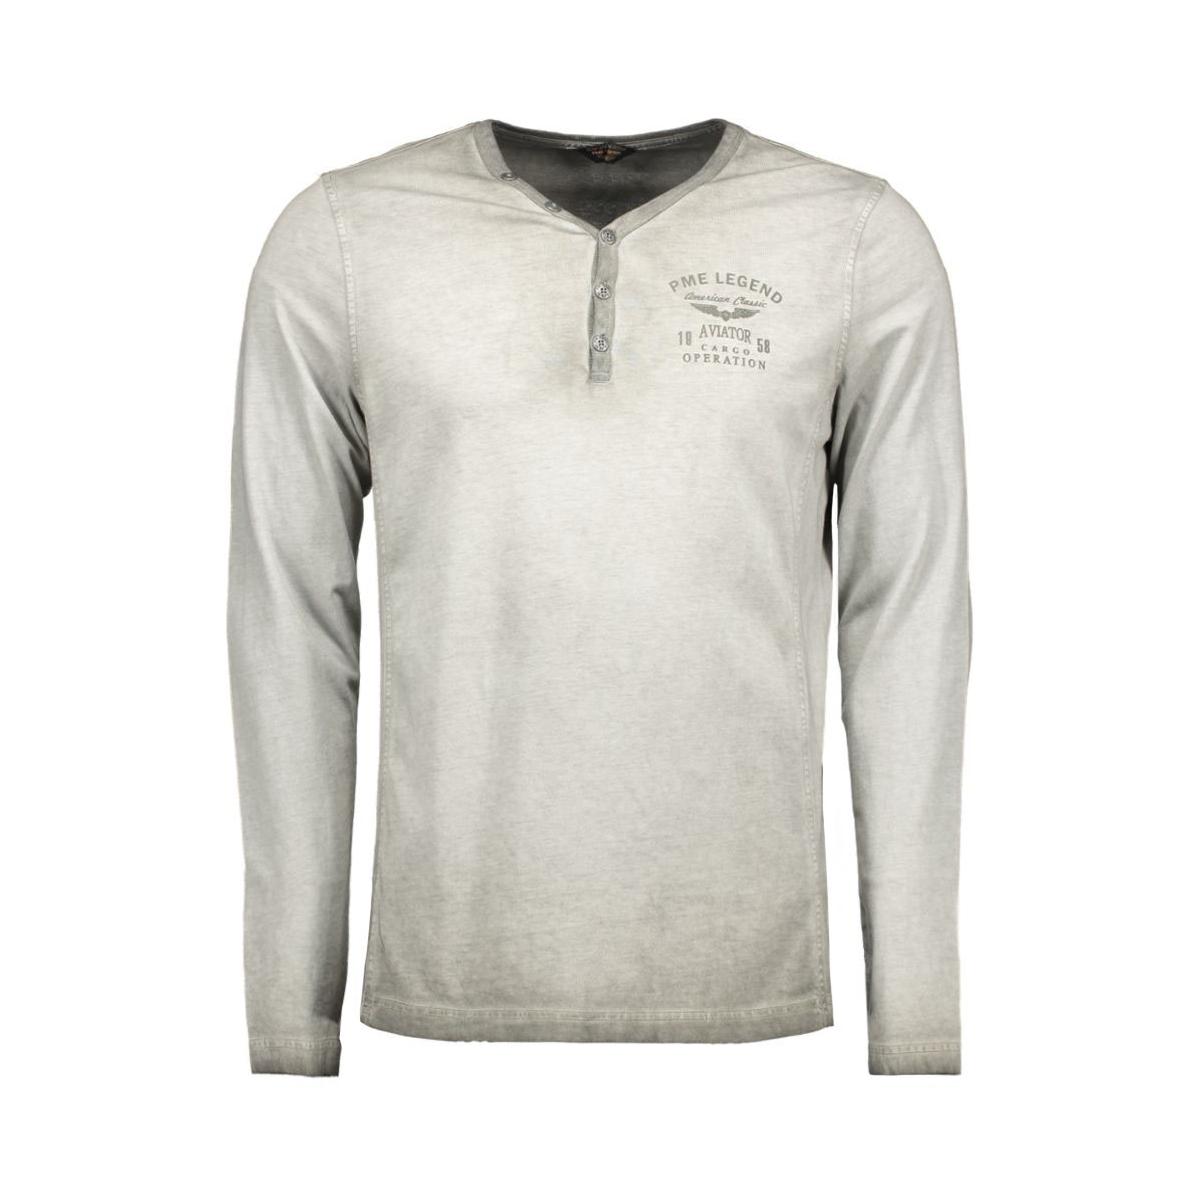 pts66531 pme legend t-shirt 9721